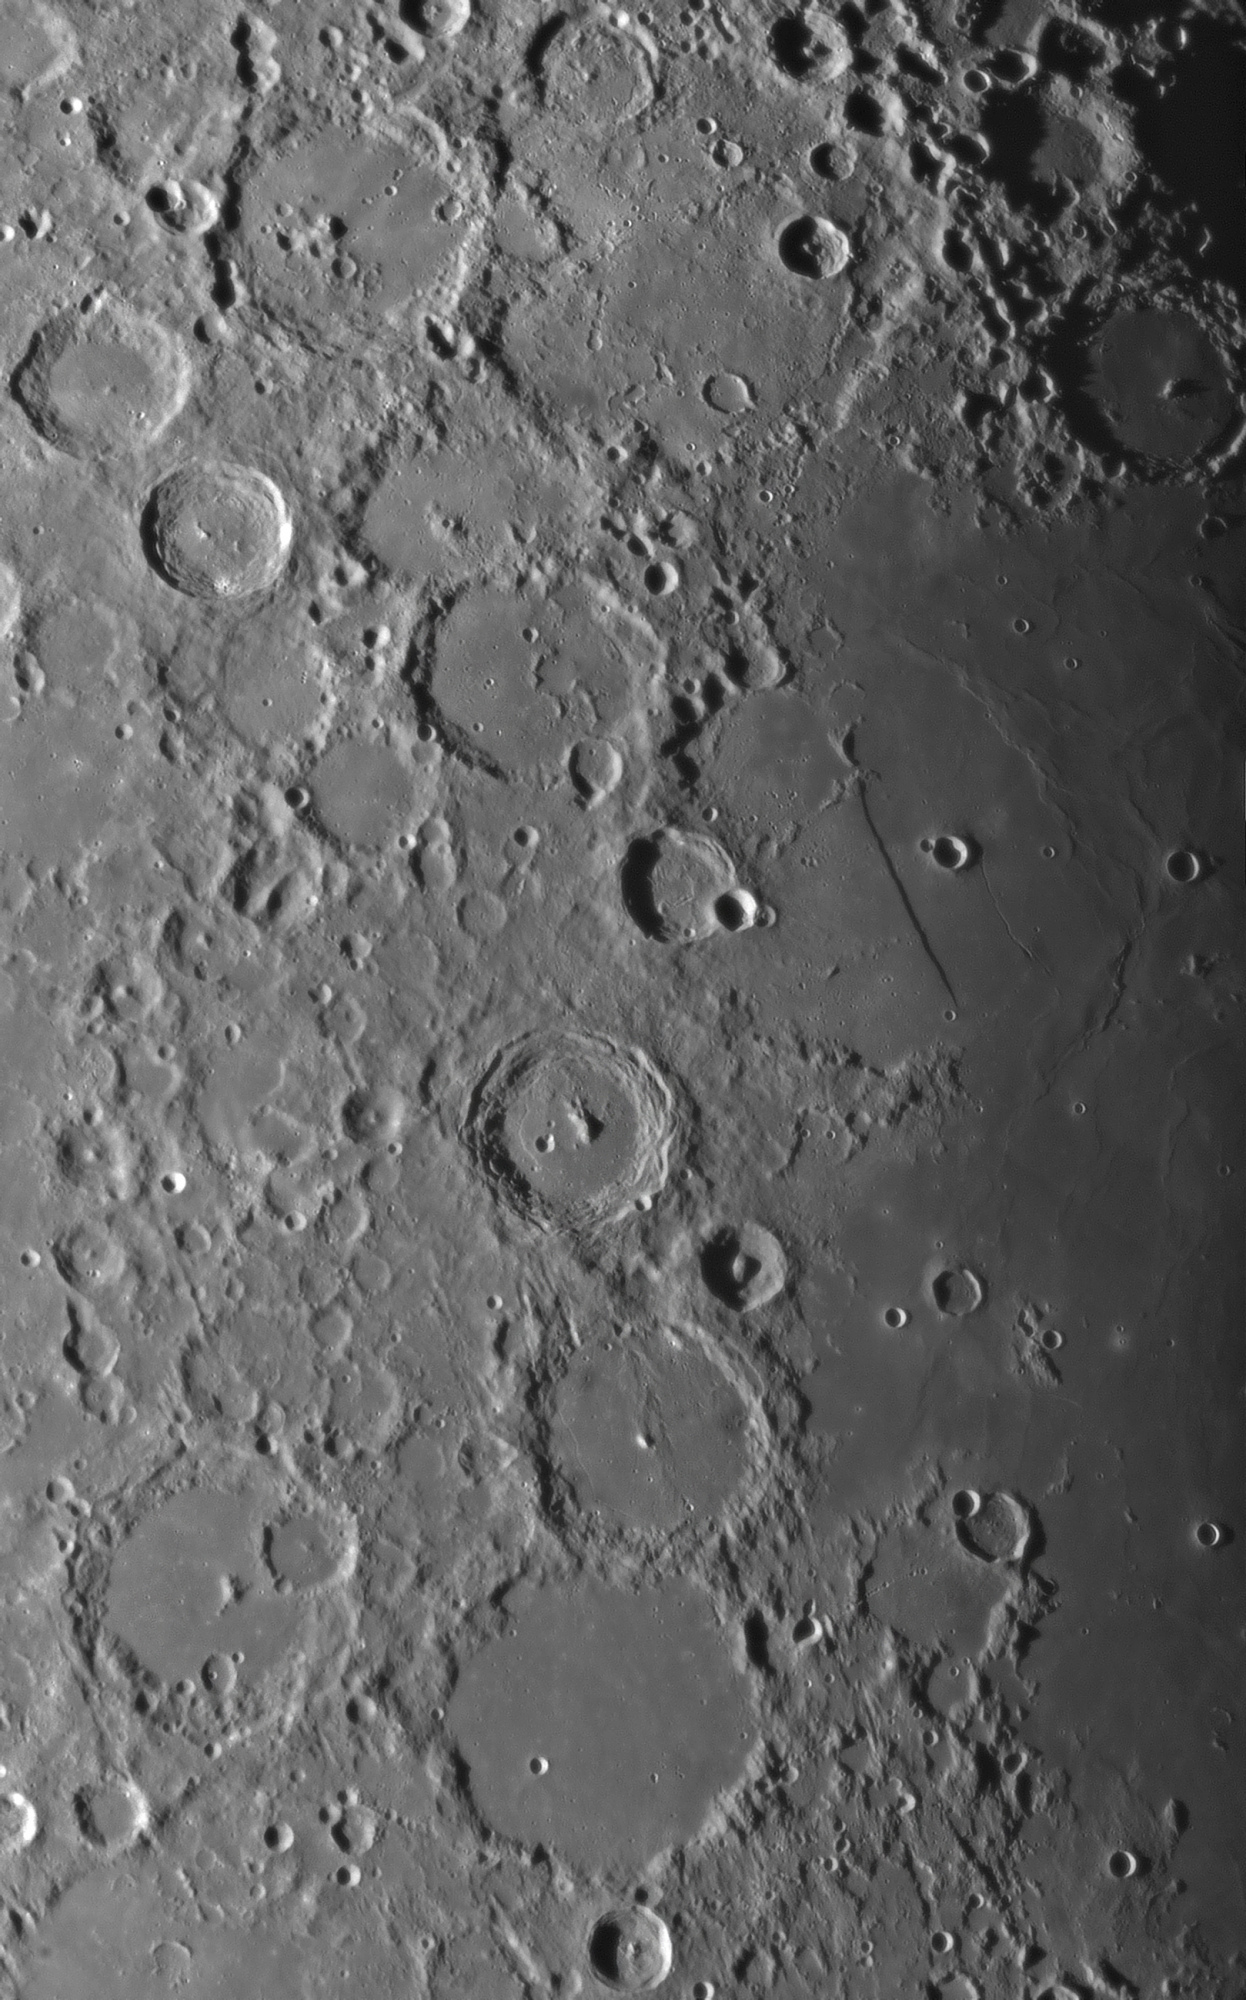 lune1.jpg